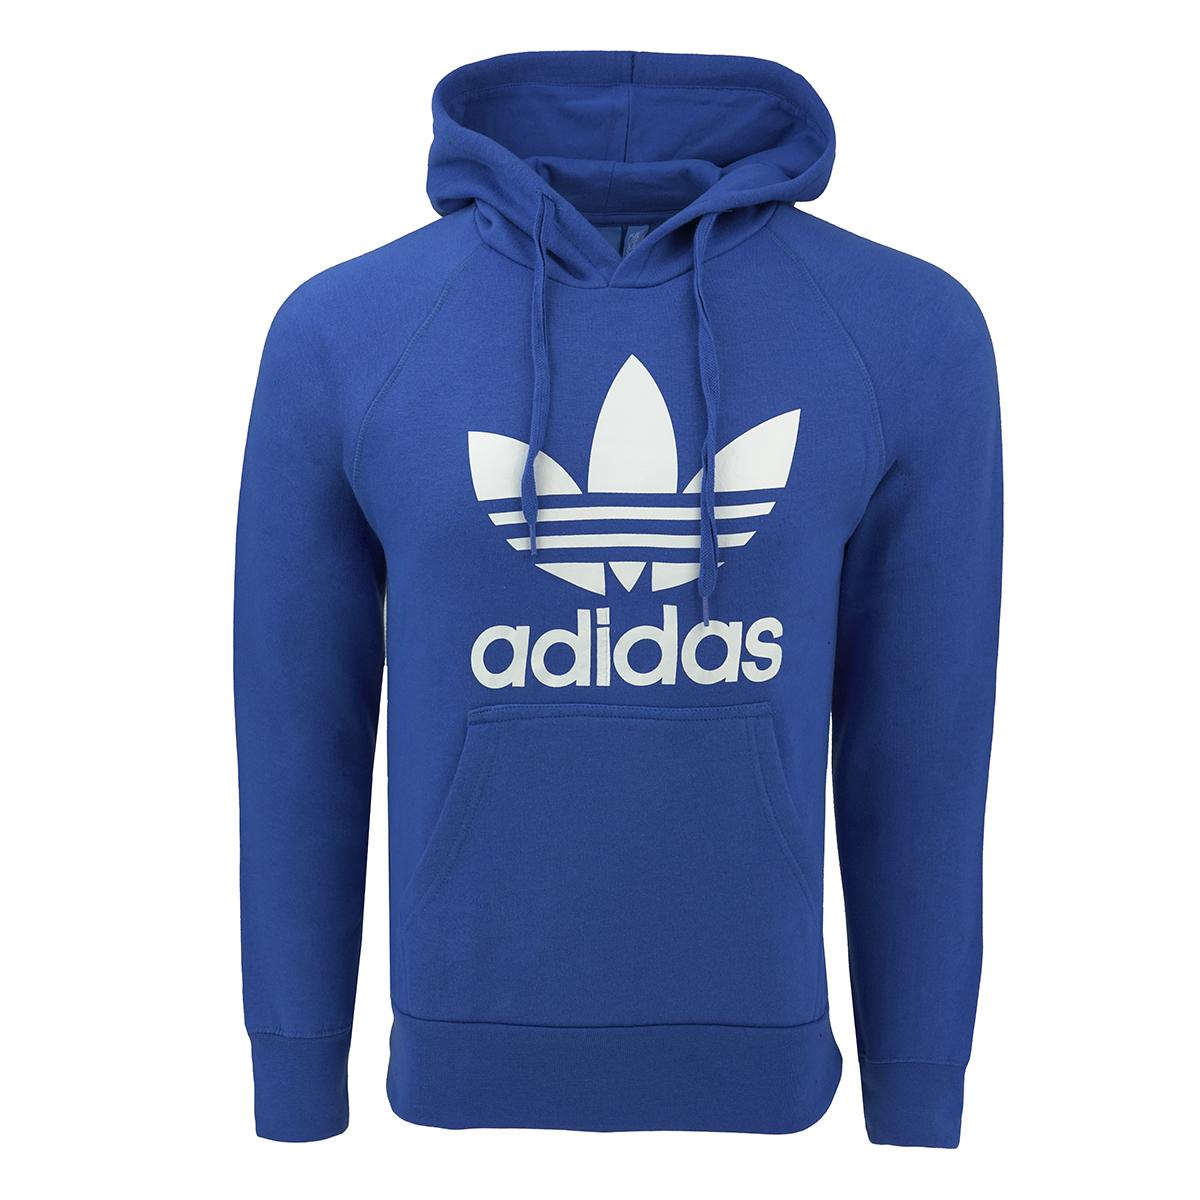 Adidas Men's Originals Trefoil Hooded Sweatshirt by Adidas